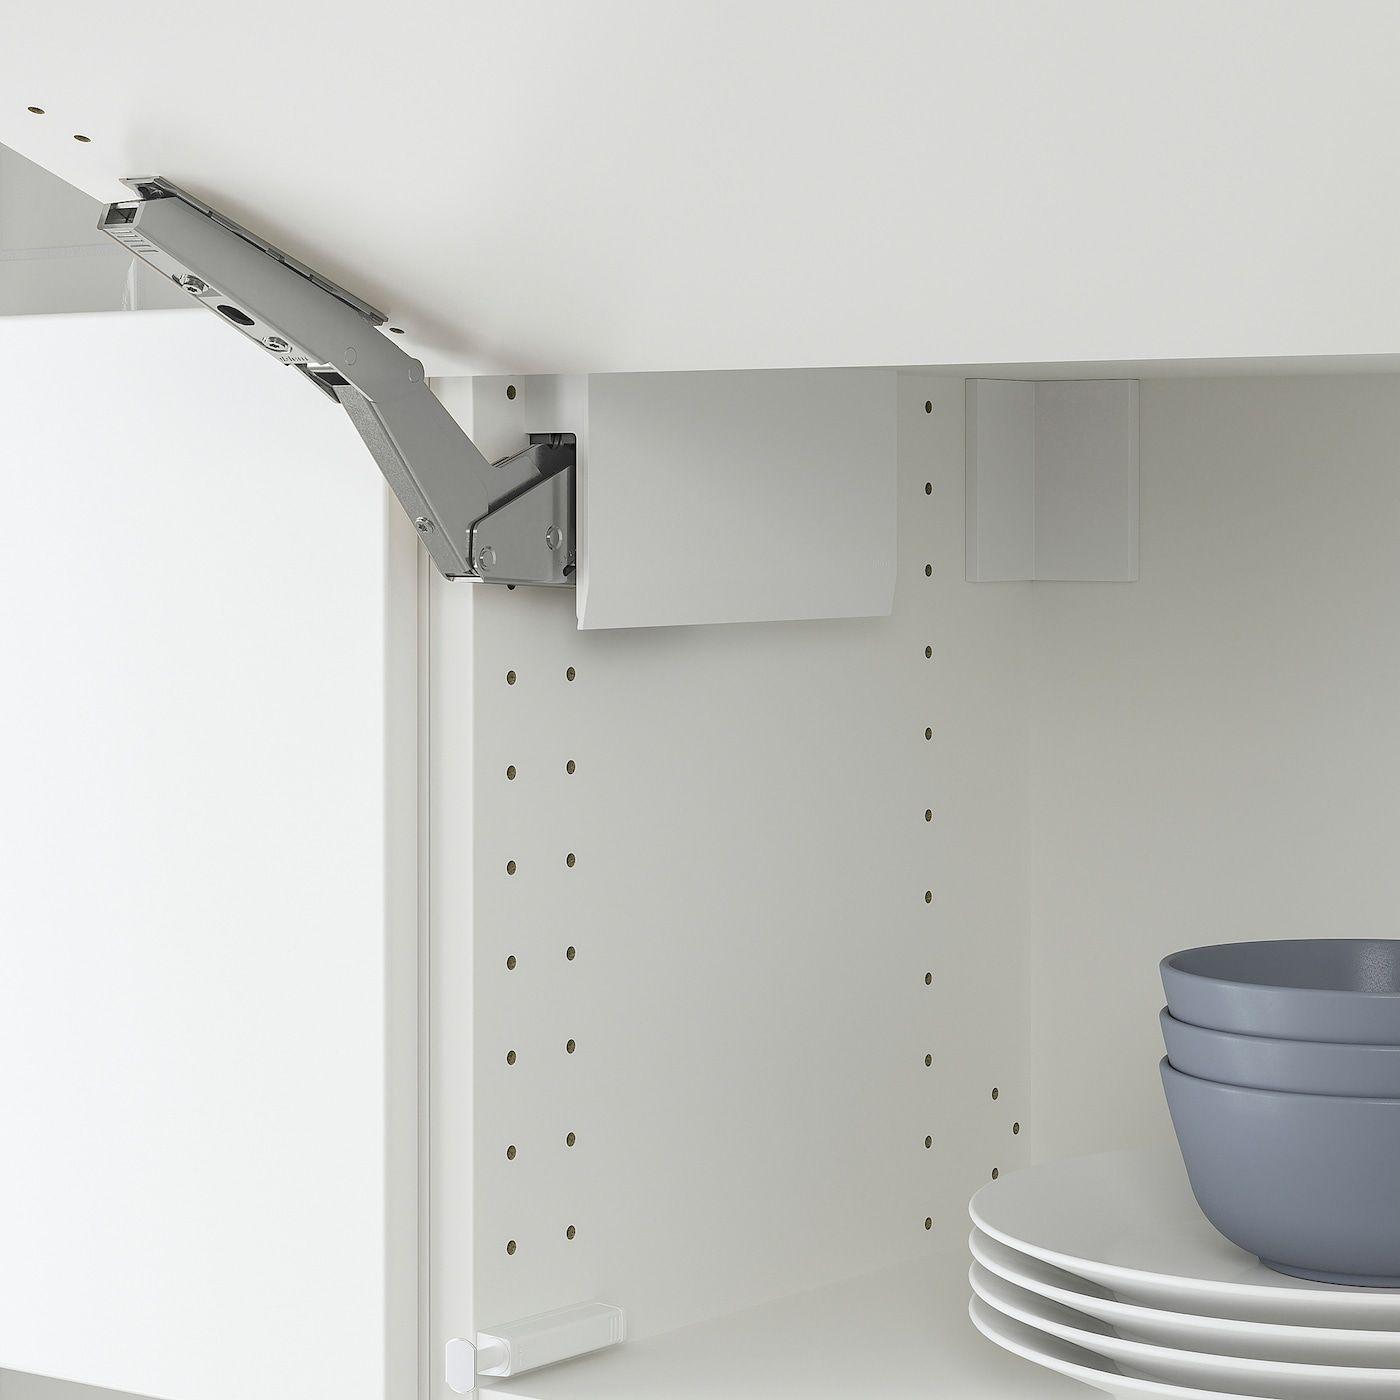 Utrusta Hinge Push Open For Horizontal Door White Ikea In 2020 Ikea Utrusta Ikea Hinges